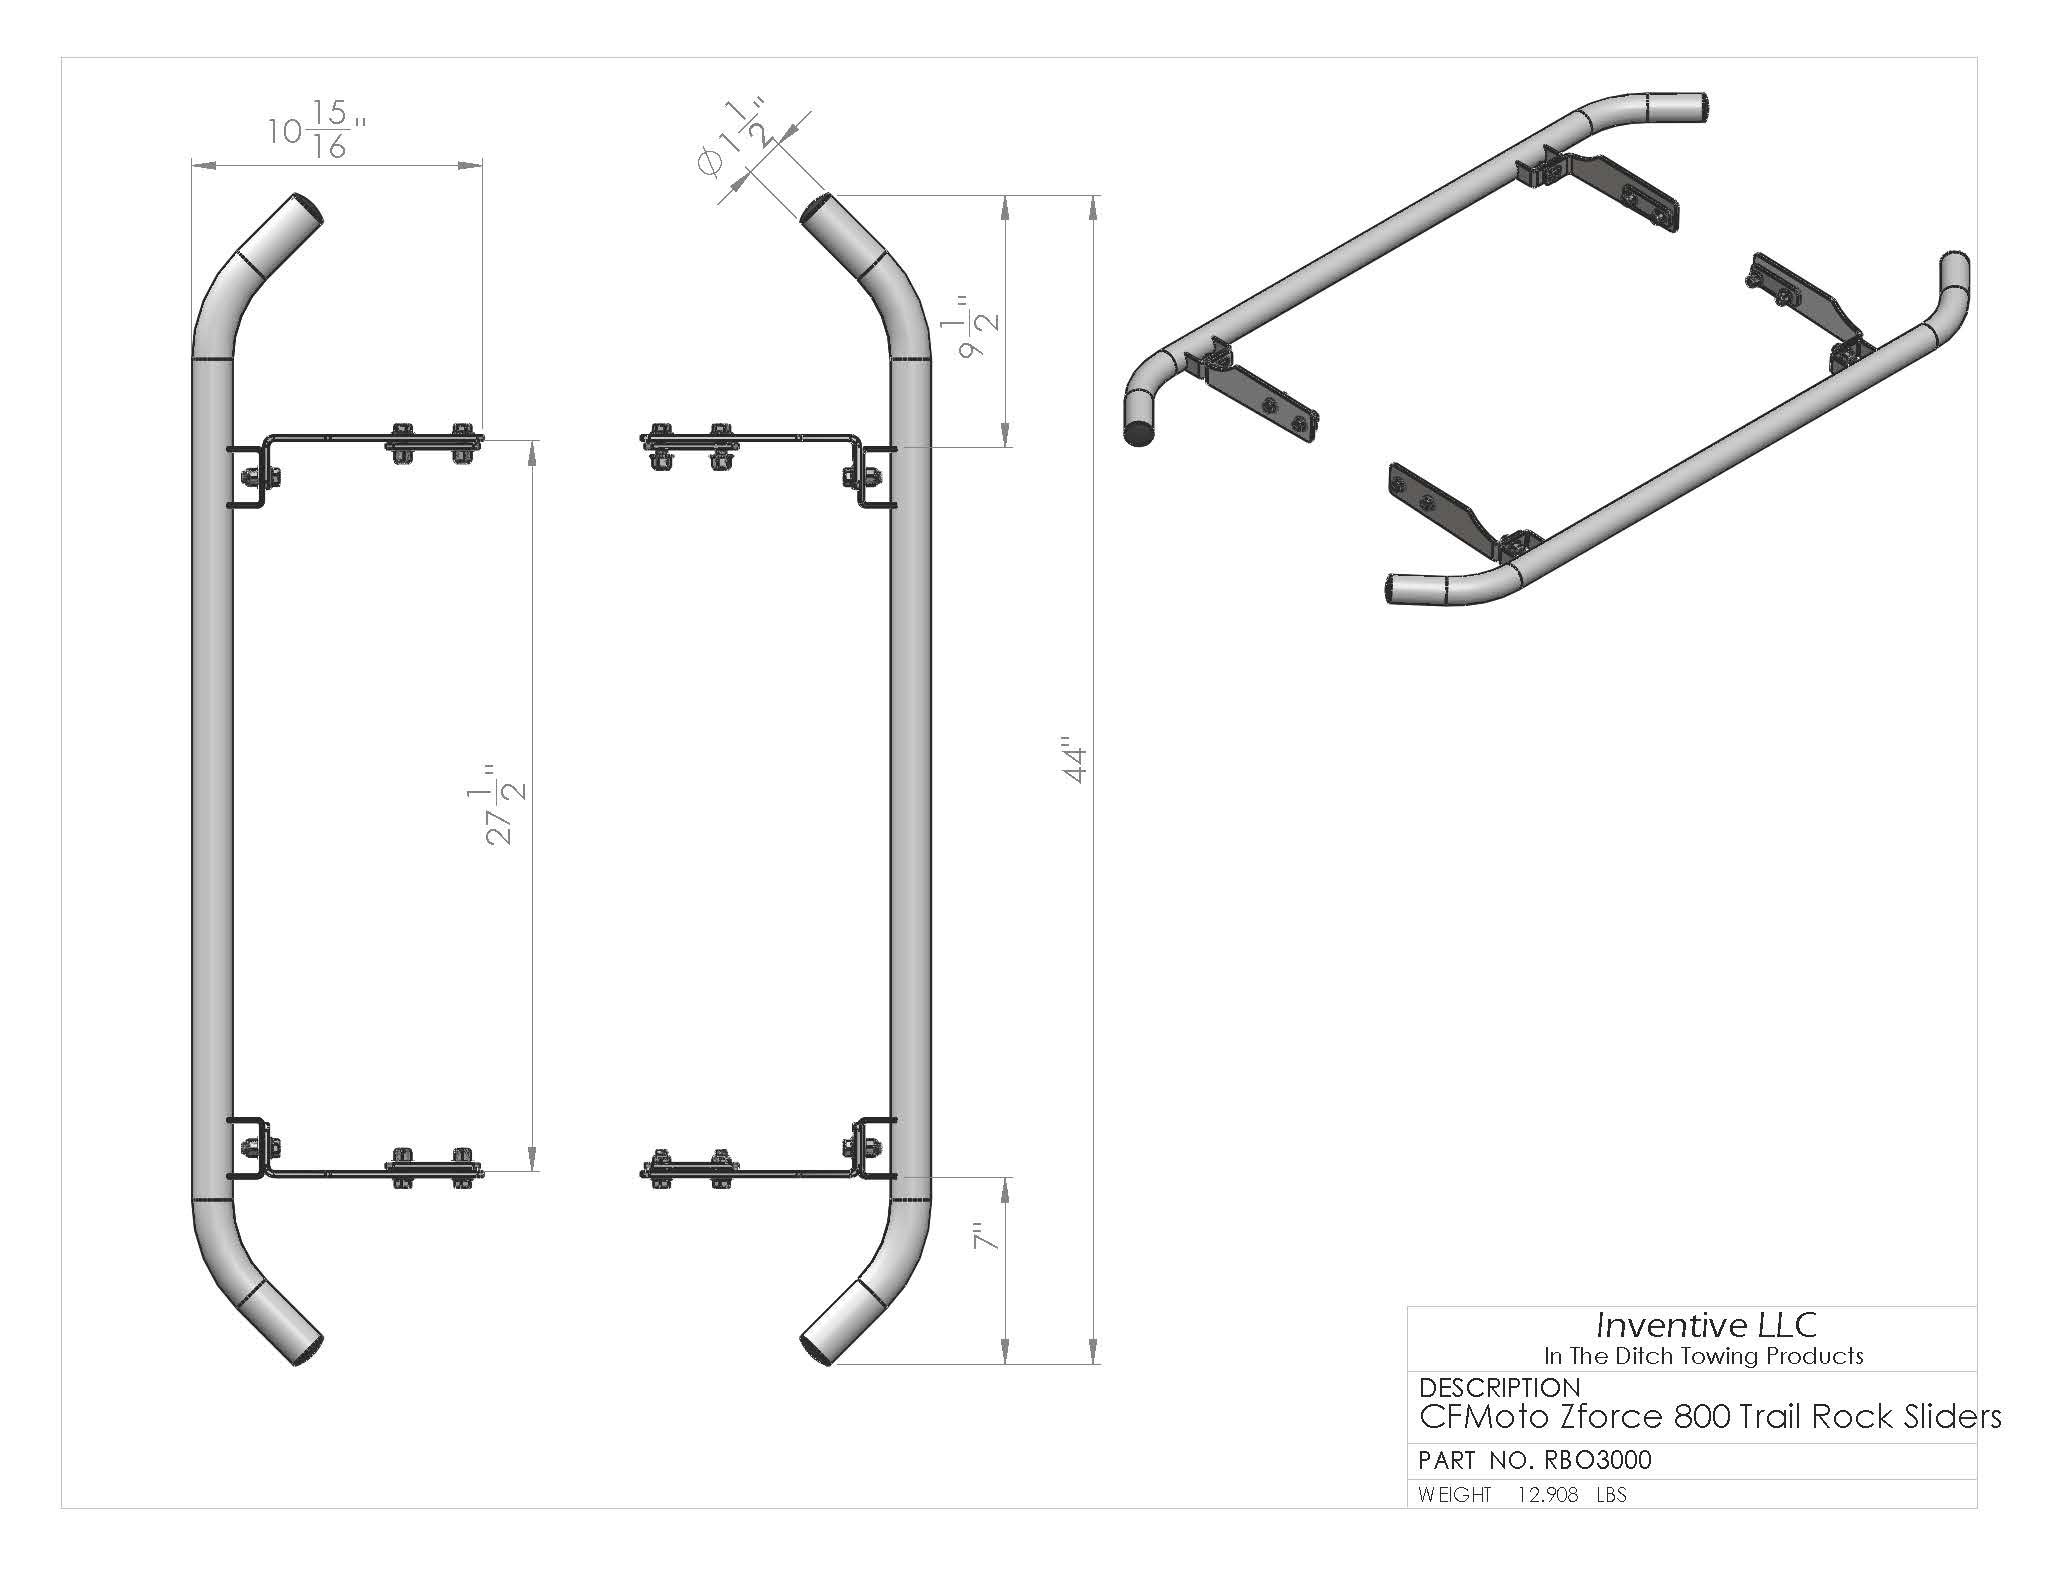 Cfmoto Zforce Rock Slider Kit Razorback Offroad Cf Moto Utv 500 Wiring Diagram Dimensions Operations Manual